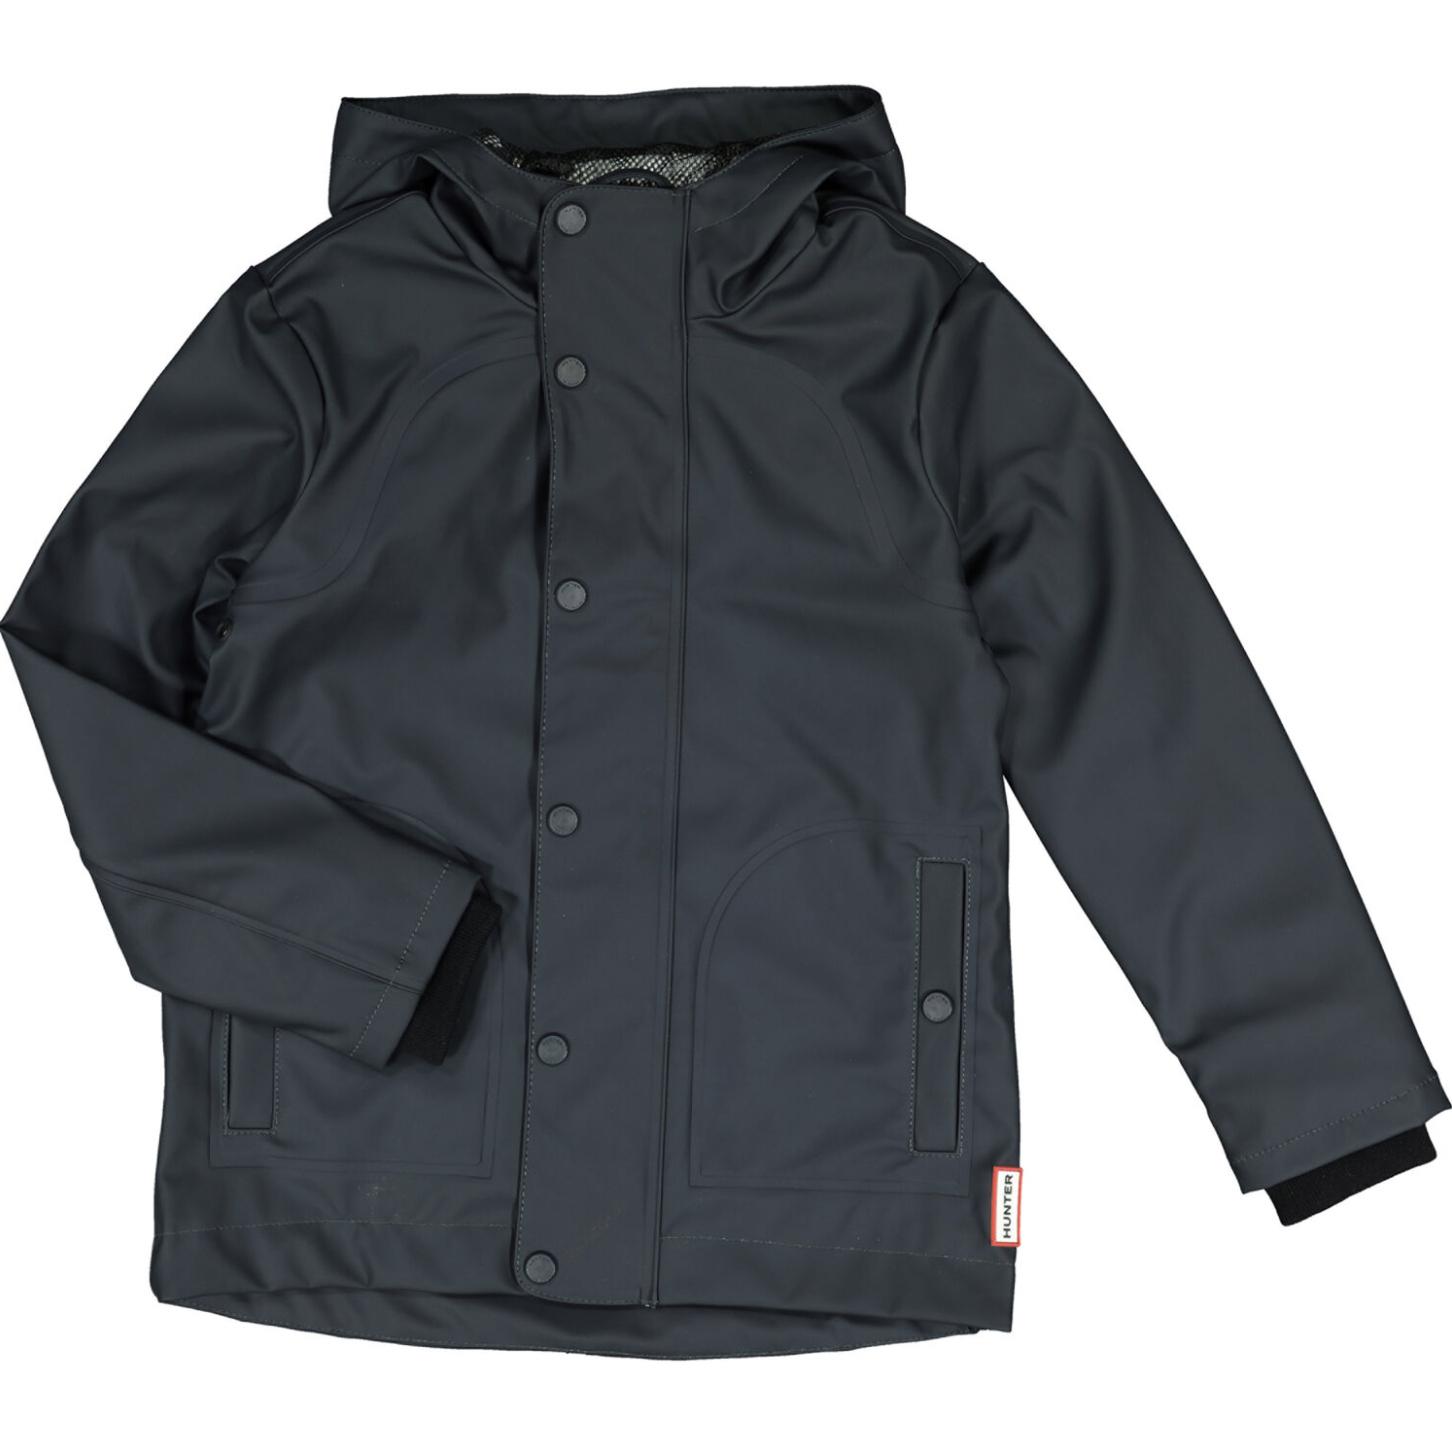 Kids Hunter Raincoat (Size 5) £21.99 C&C @ TK Maxx